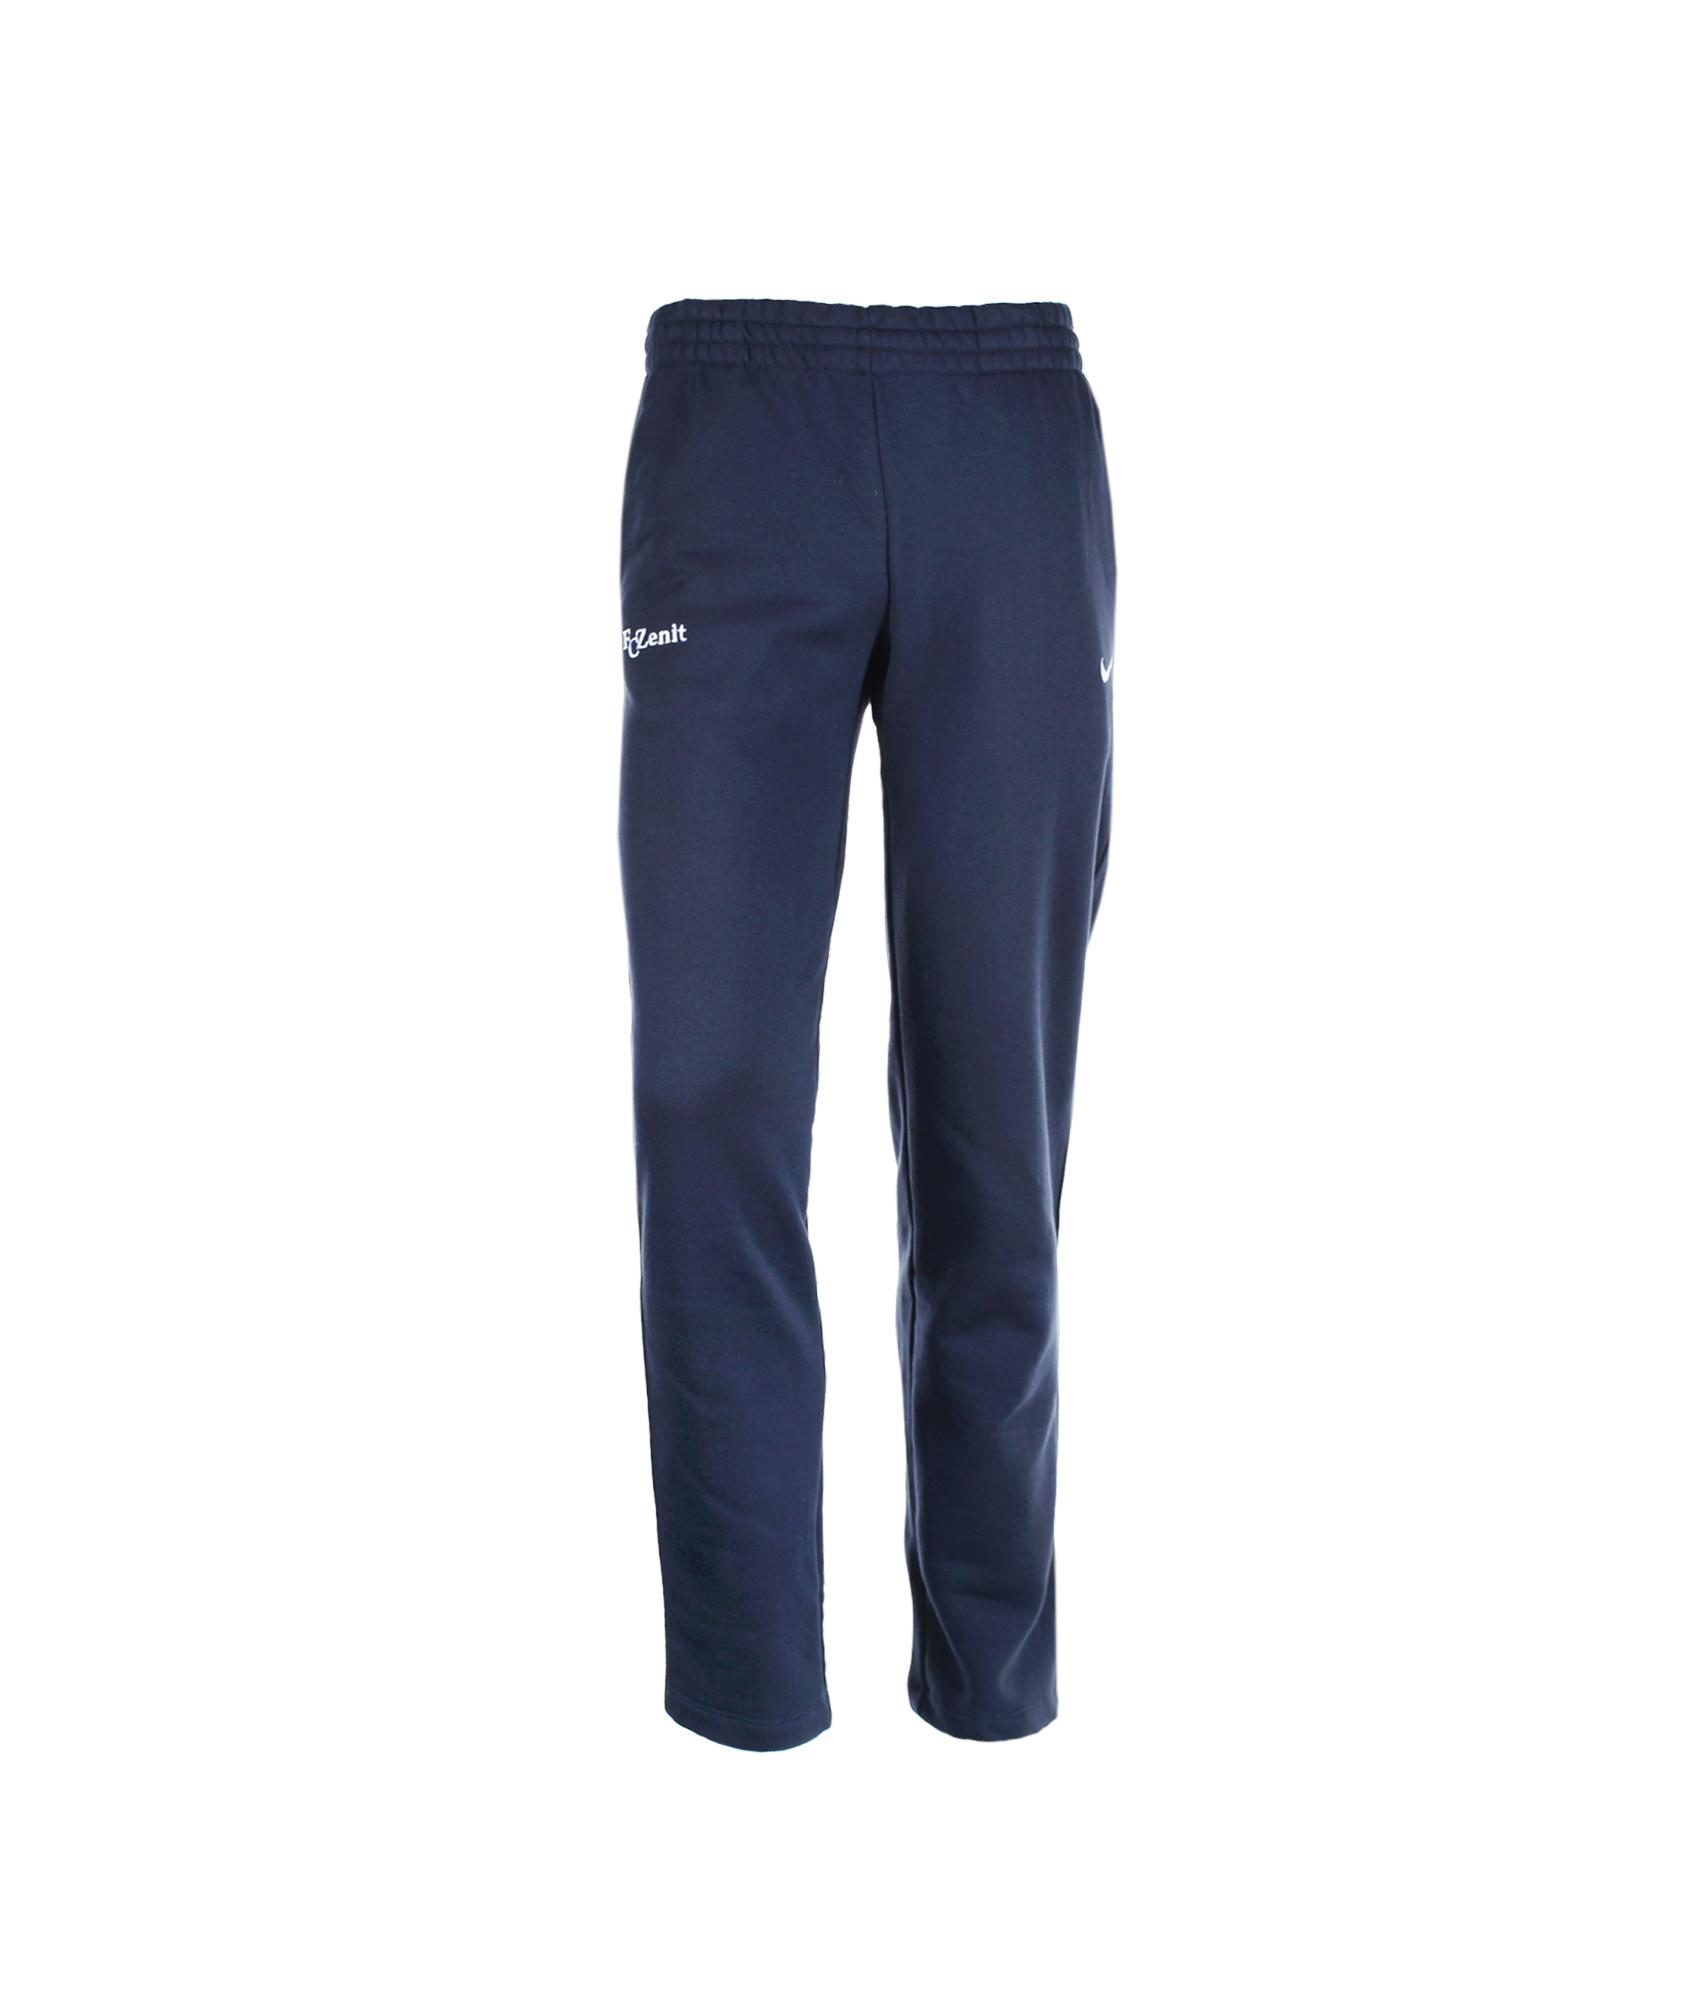 Брюки Nike Squad Fleece Open Hem Pant, Цвет-Темно-Синий, Размер-XXL